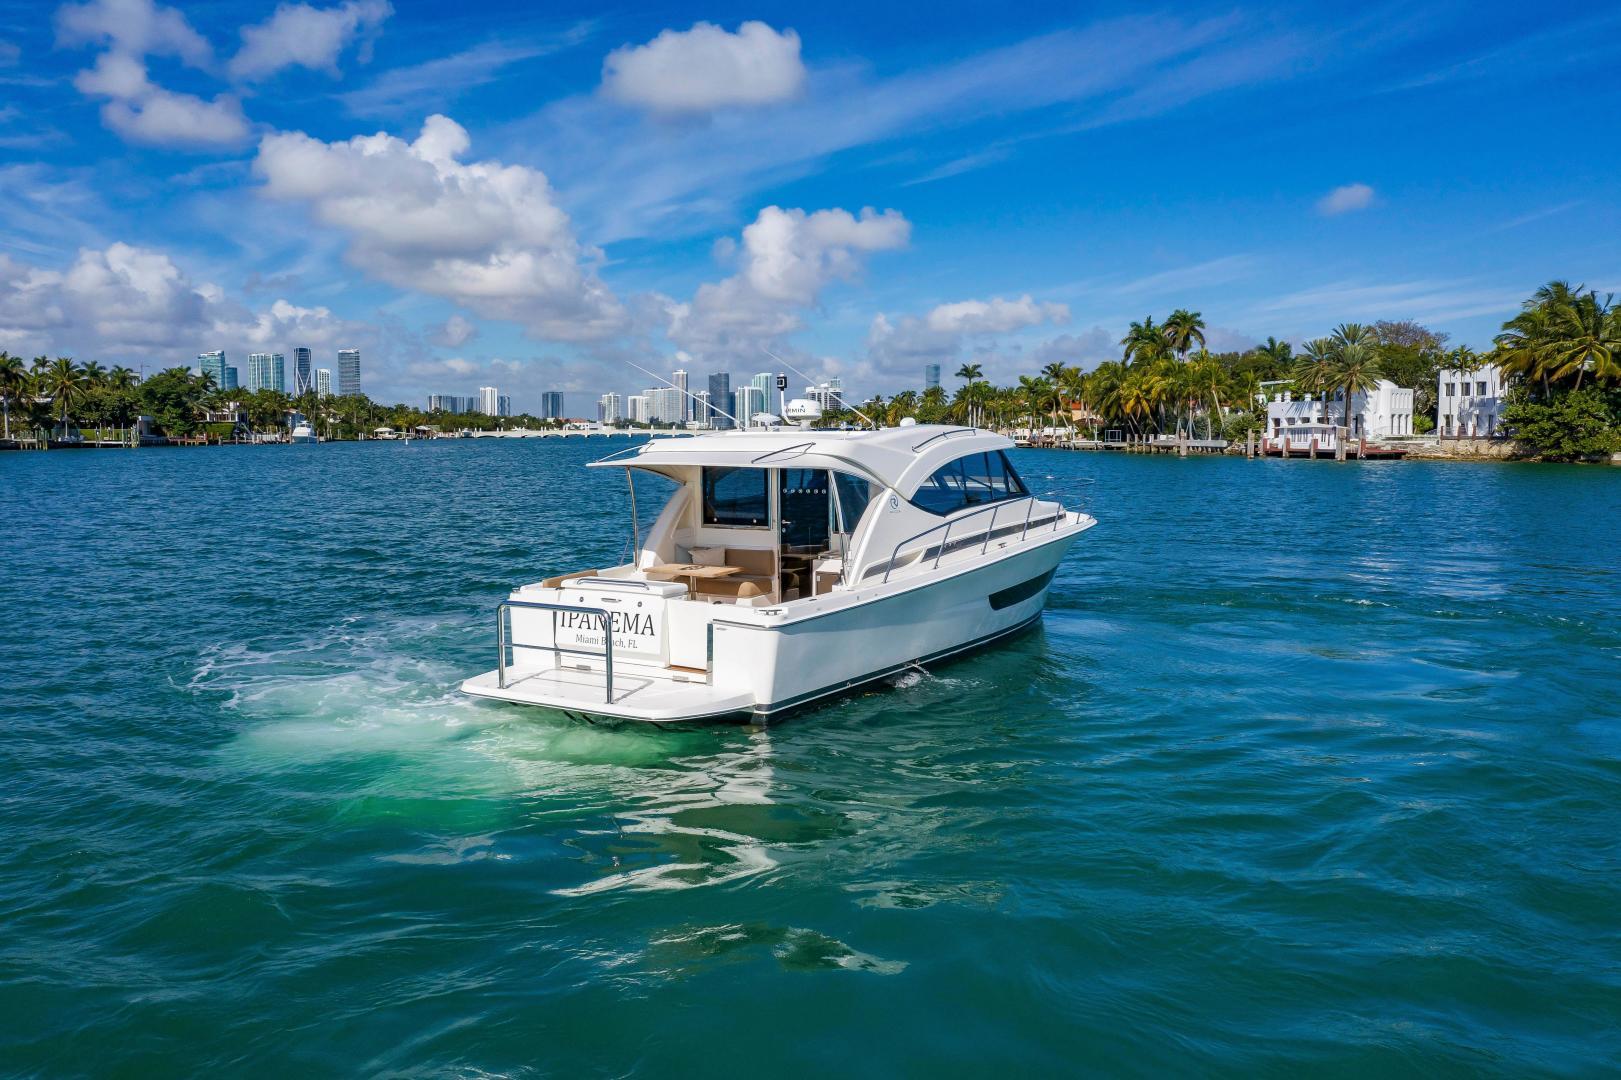 Riviera-395 SUV 2019-Ipanema Miami Beach-Florida-United States-1614871   Thumbnail